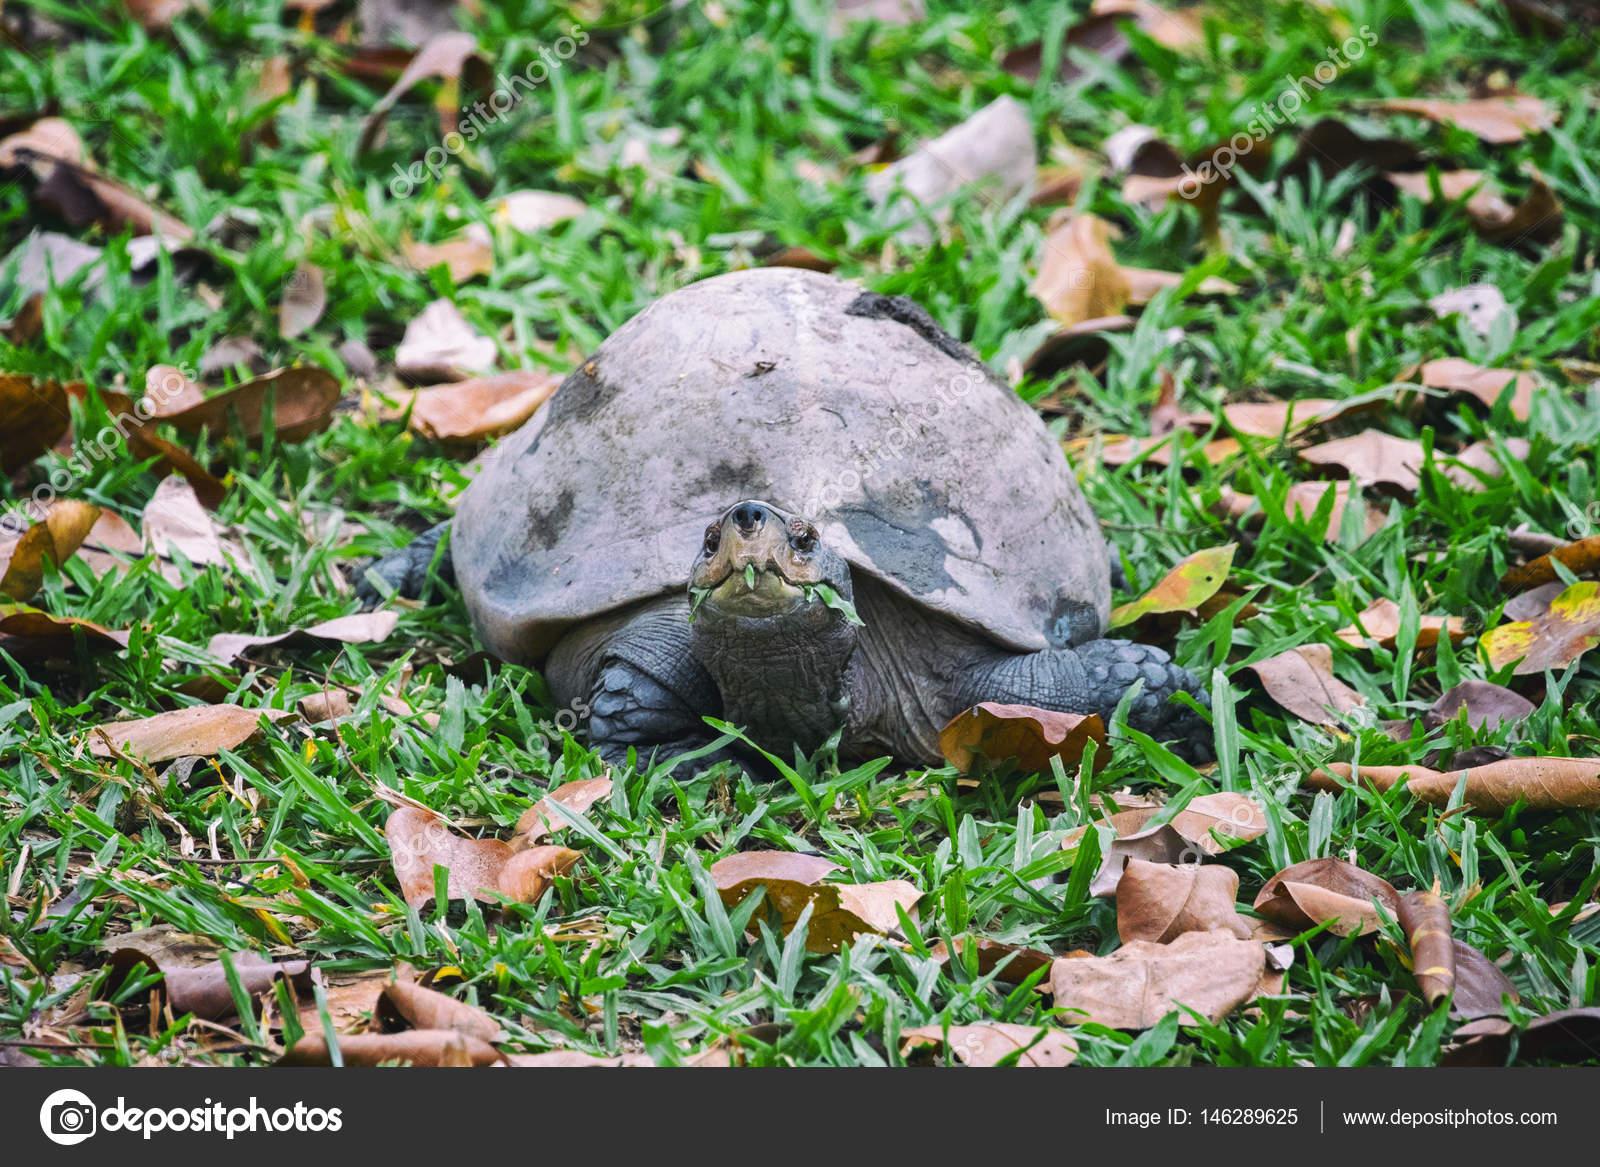 imagem de uma tartaruga na grama anfíbios stock photo yod67